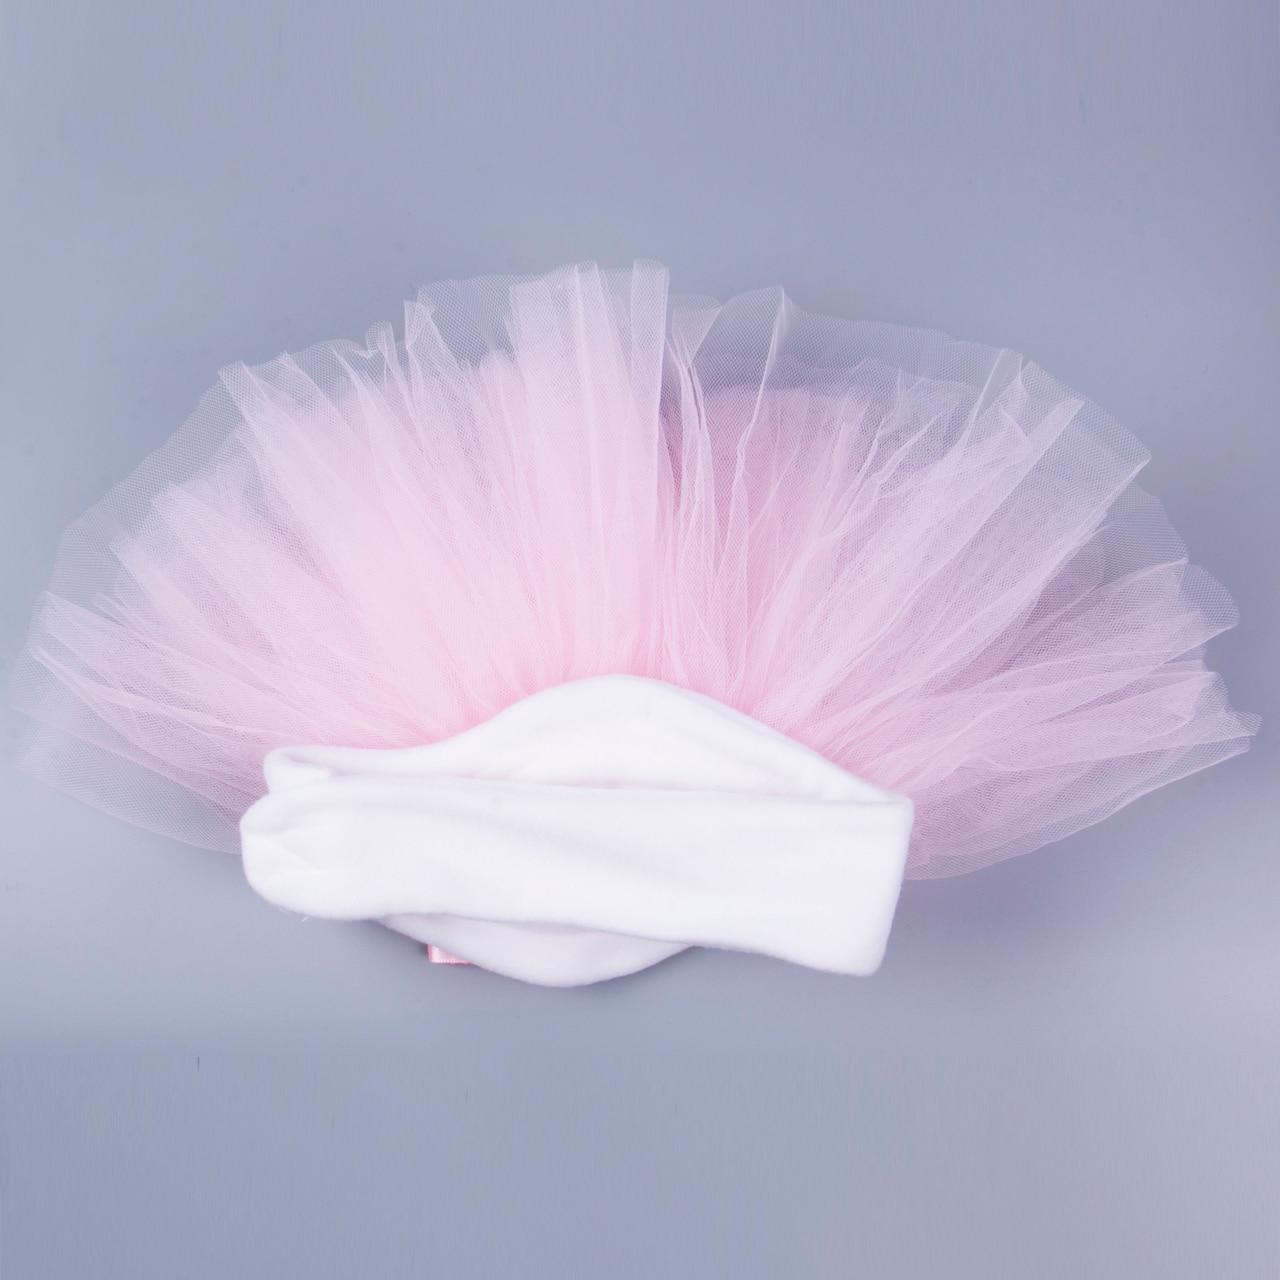 0-24M-Newborn-Toddler-Infant-Baby-Tutu-Clothes-Skirt-Headdress-Flower-Photography-Prop-2PCS-Outfit-0-24M-4